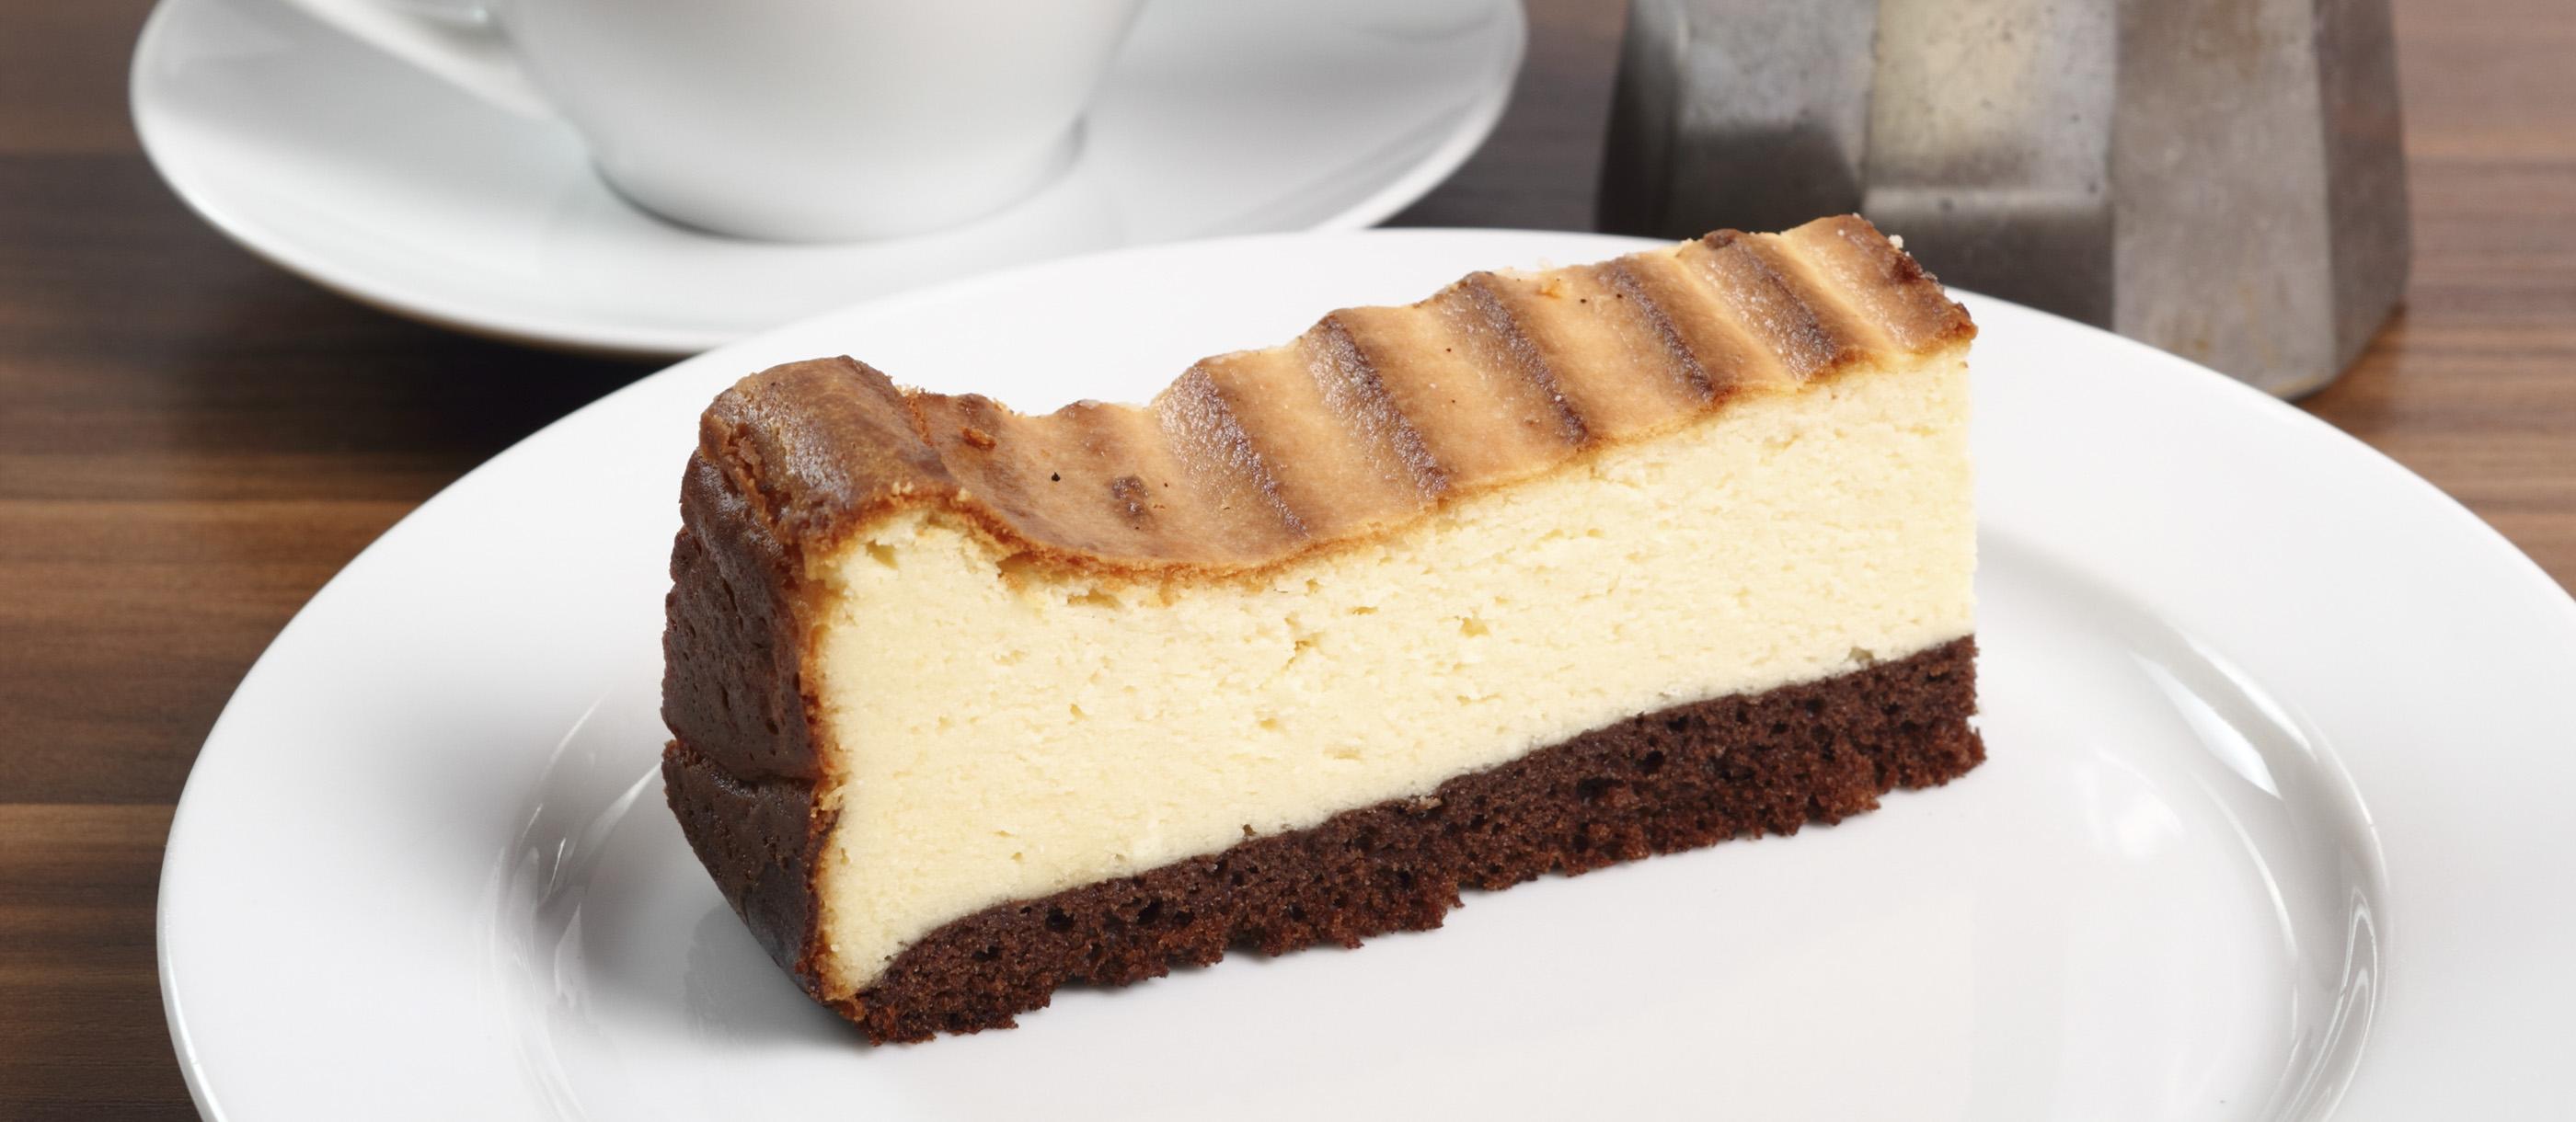 Sernik | Traditional Cheese Dessert From Poland